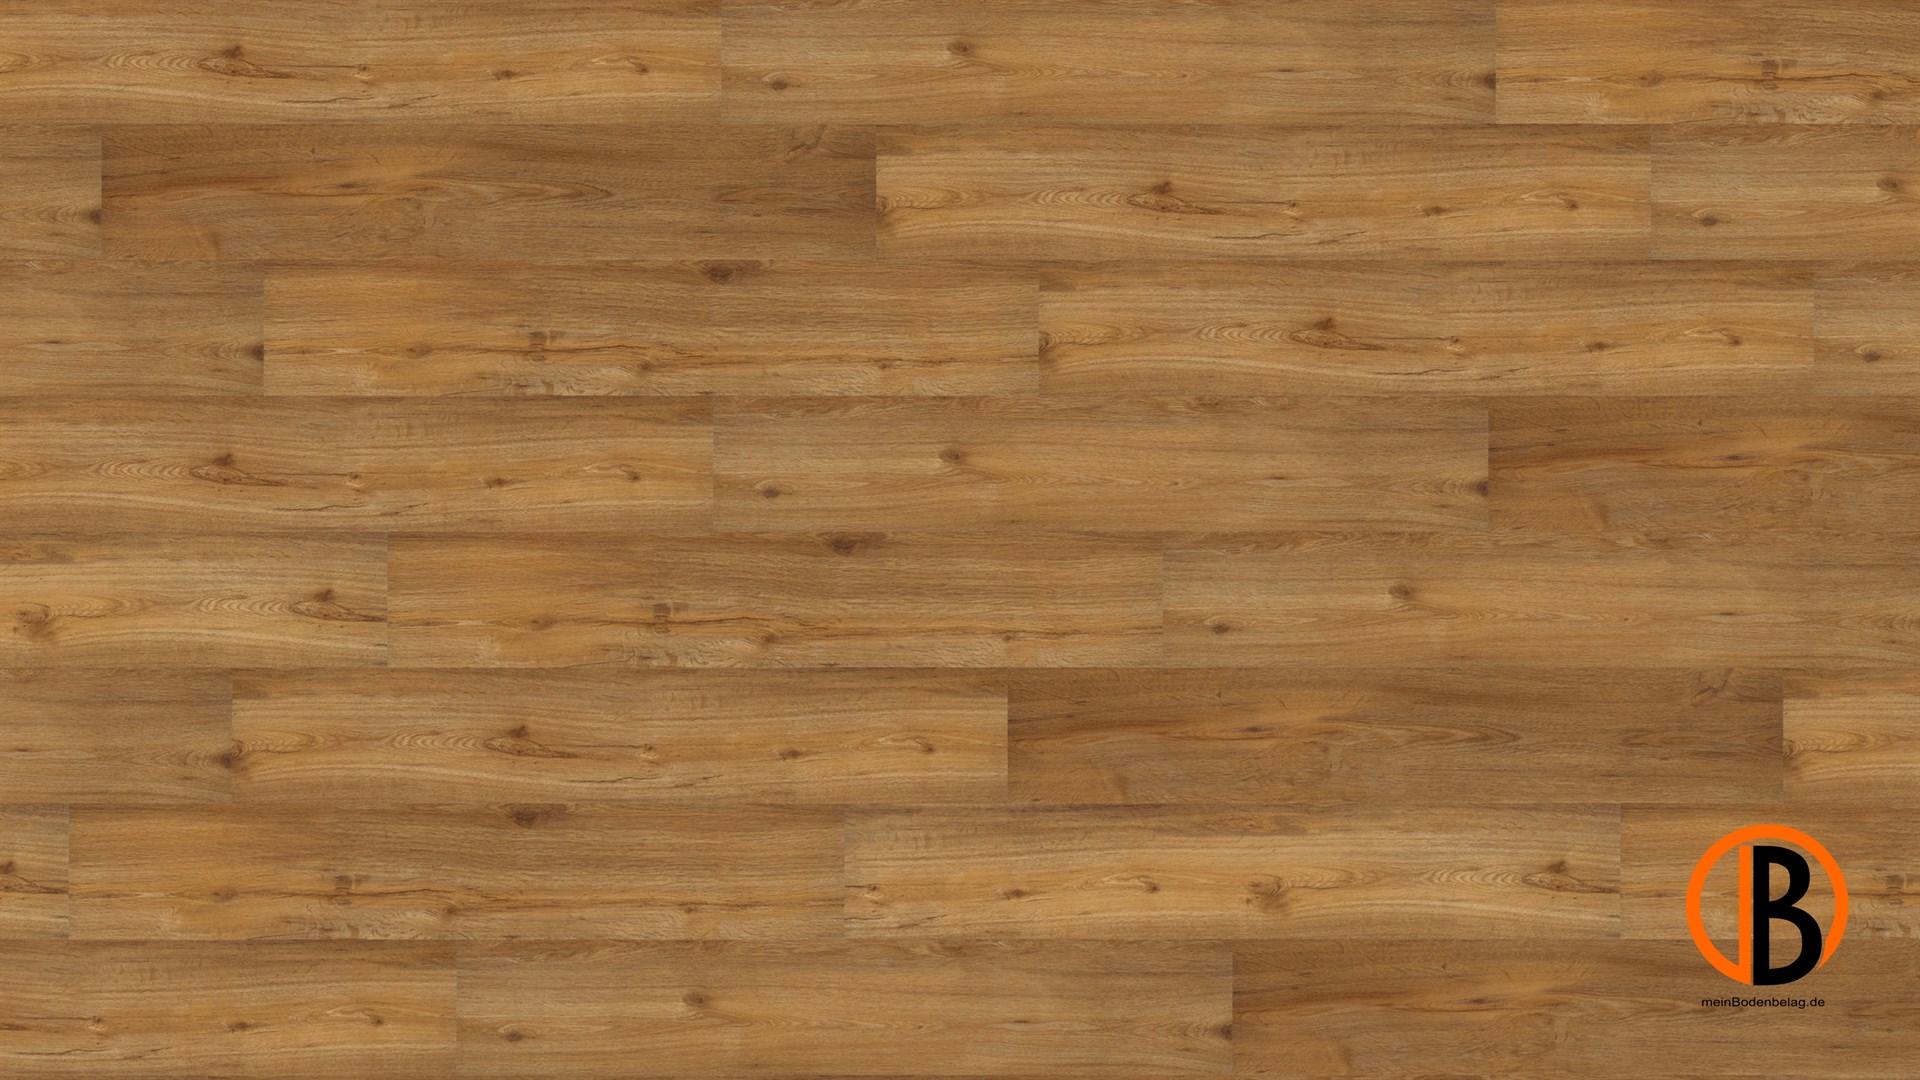 CINQUE KWG DESIGNERVINYL ANTIGUA INFINITY HDF | 10000120;0 | Bild 1